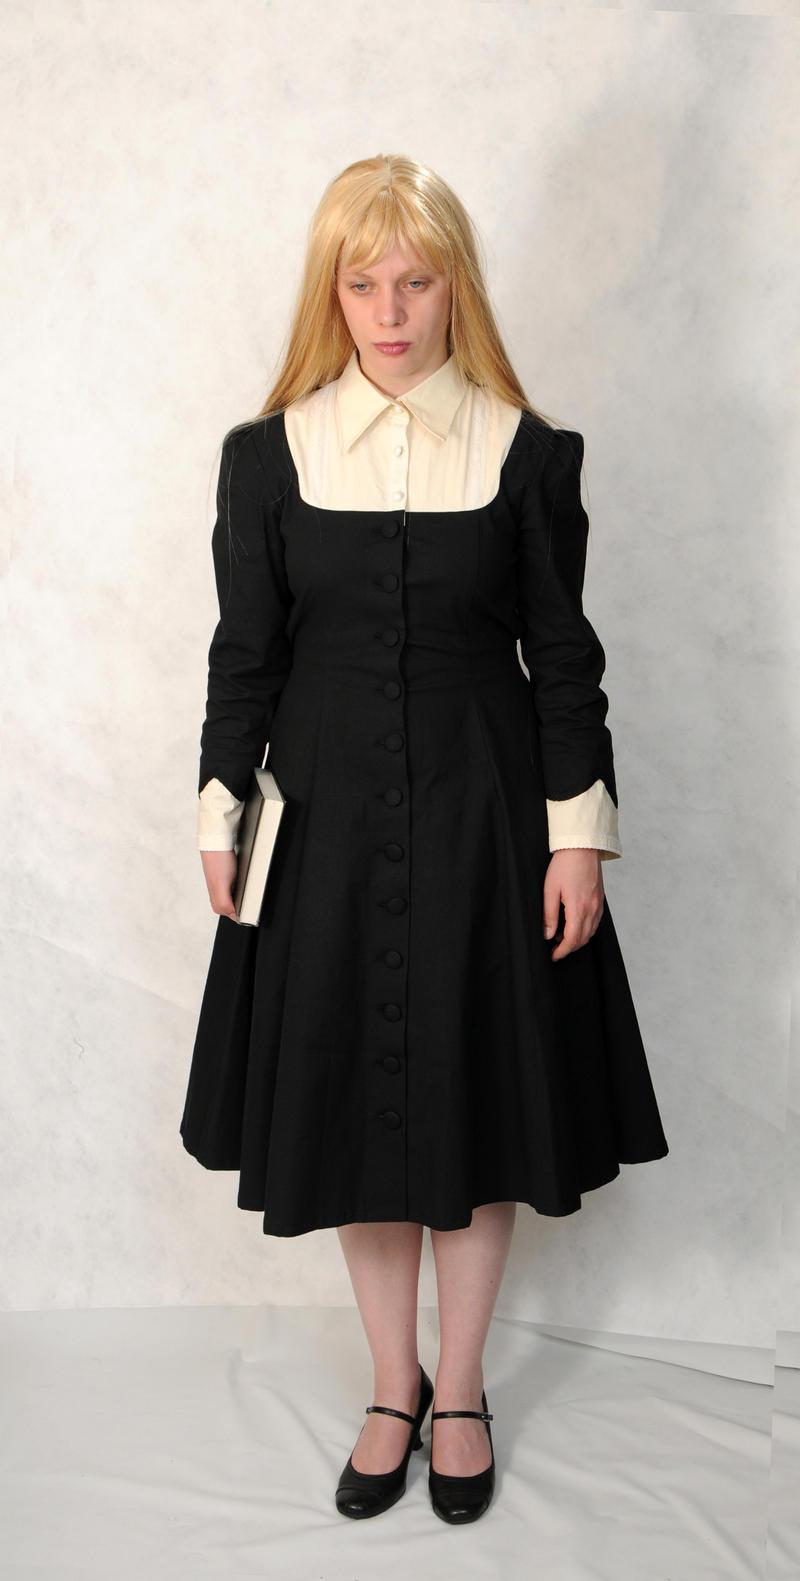 Black dress 1